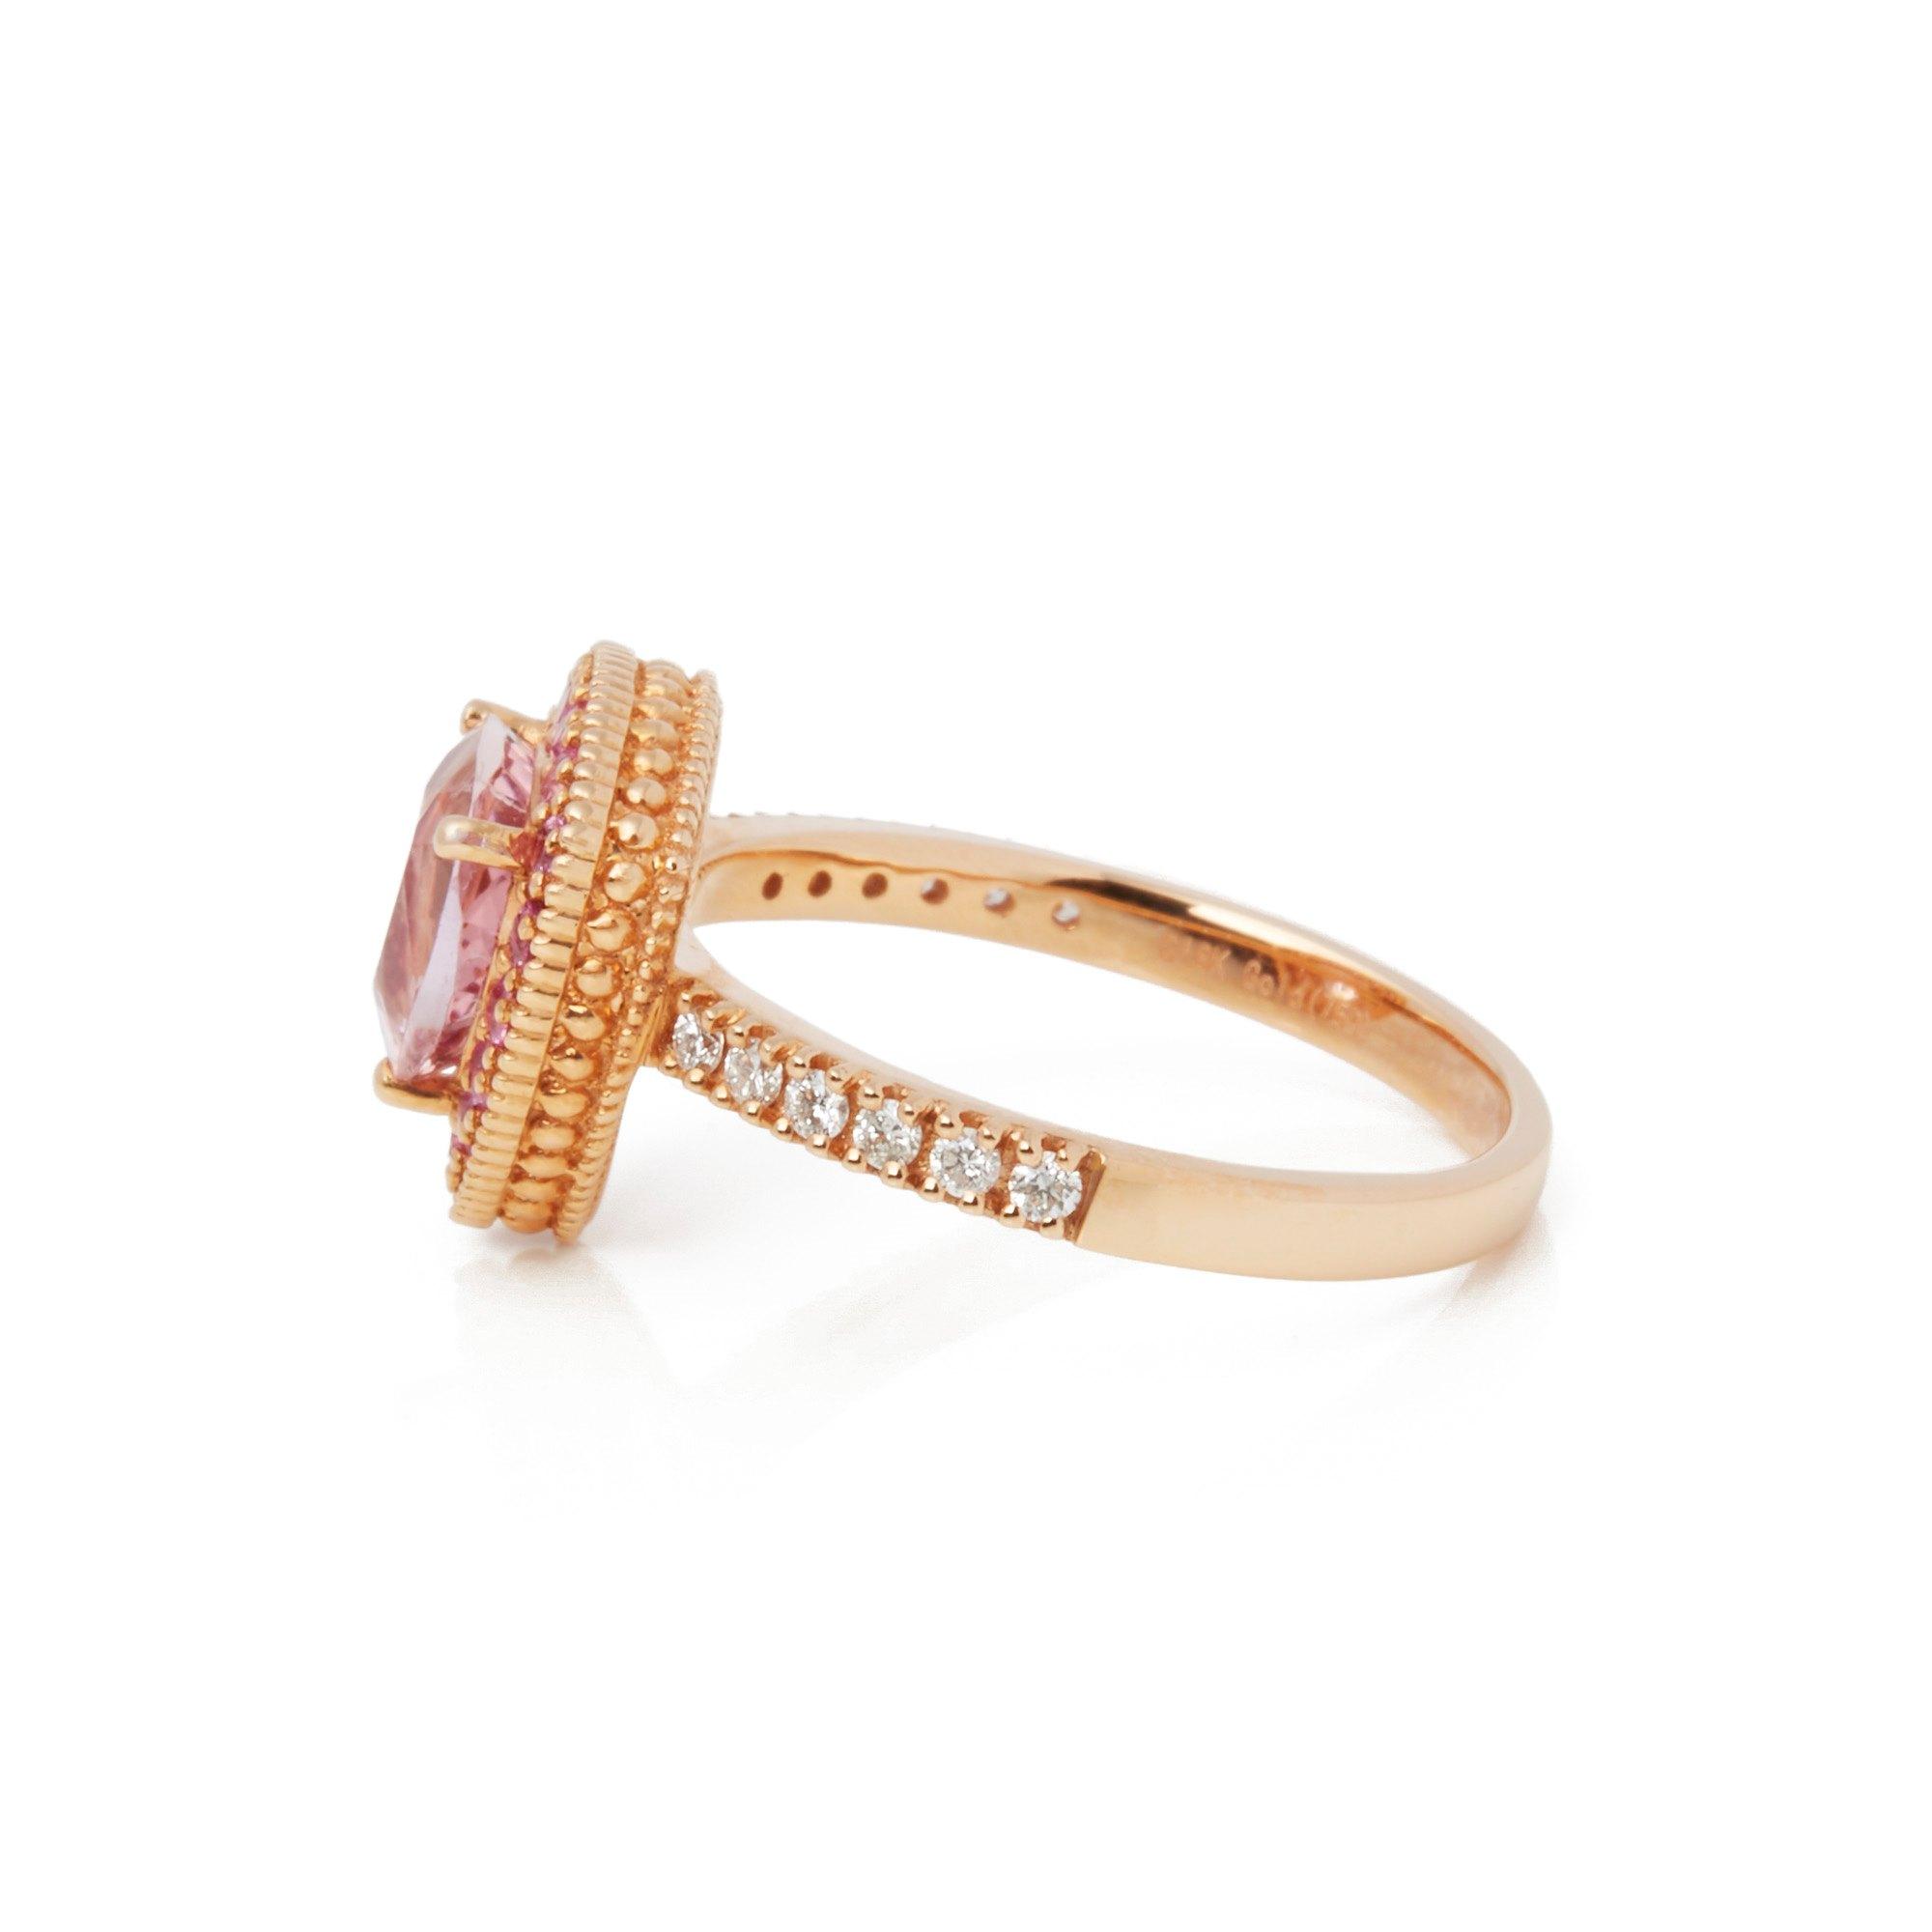 David Jerome Certified 1.49ct Trilliant Cut Pink Morganite and Diamond Ring